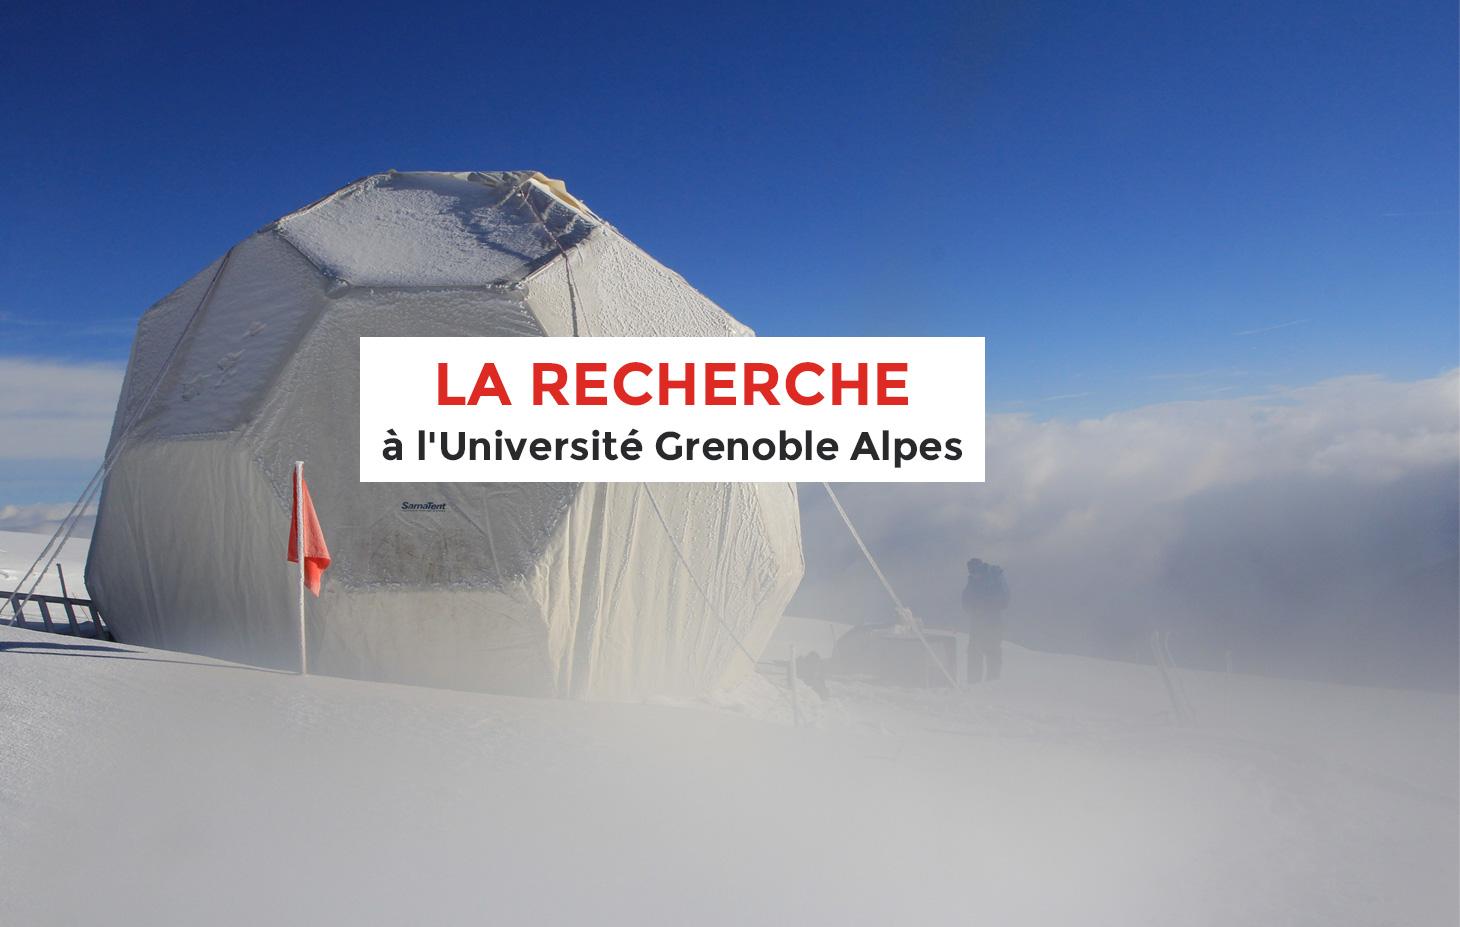 Expédition d'étude en glaciologie - recherche - UGA